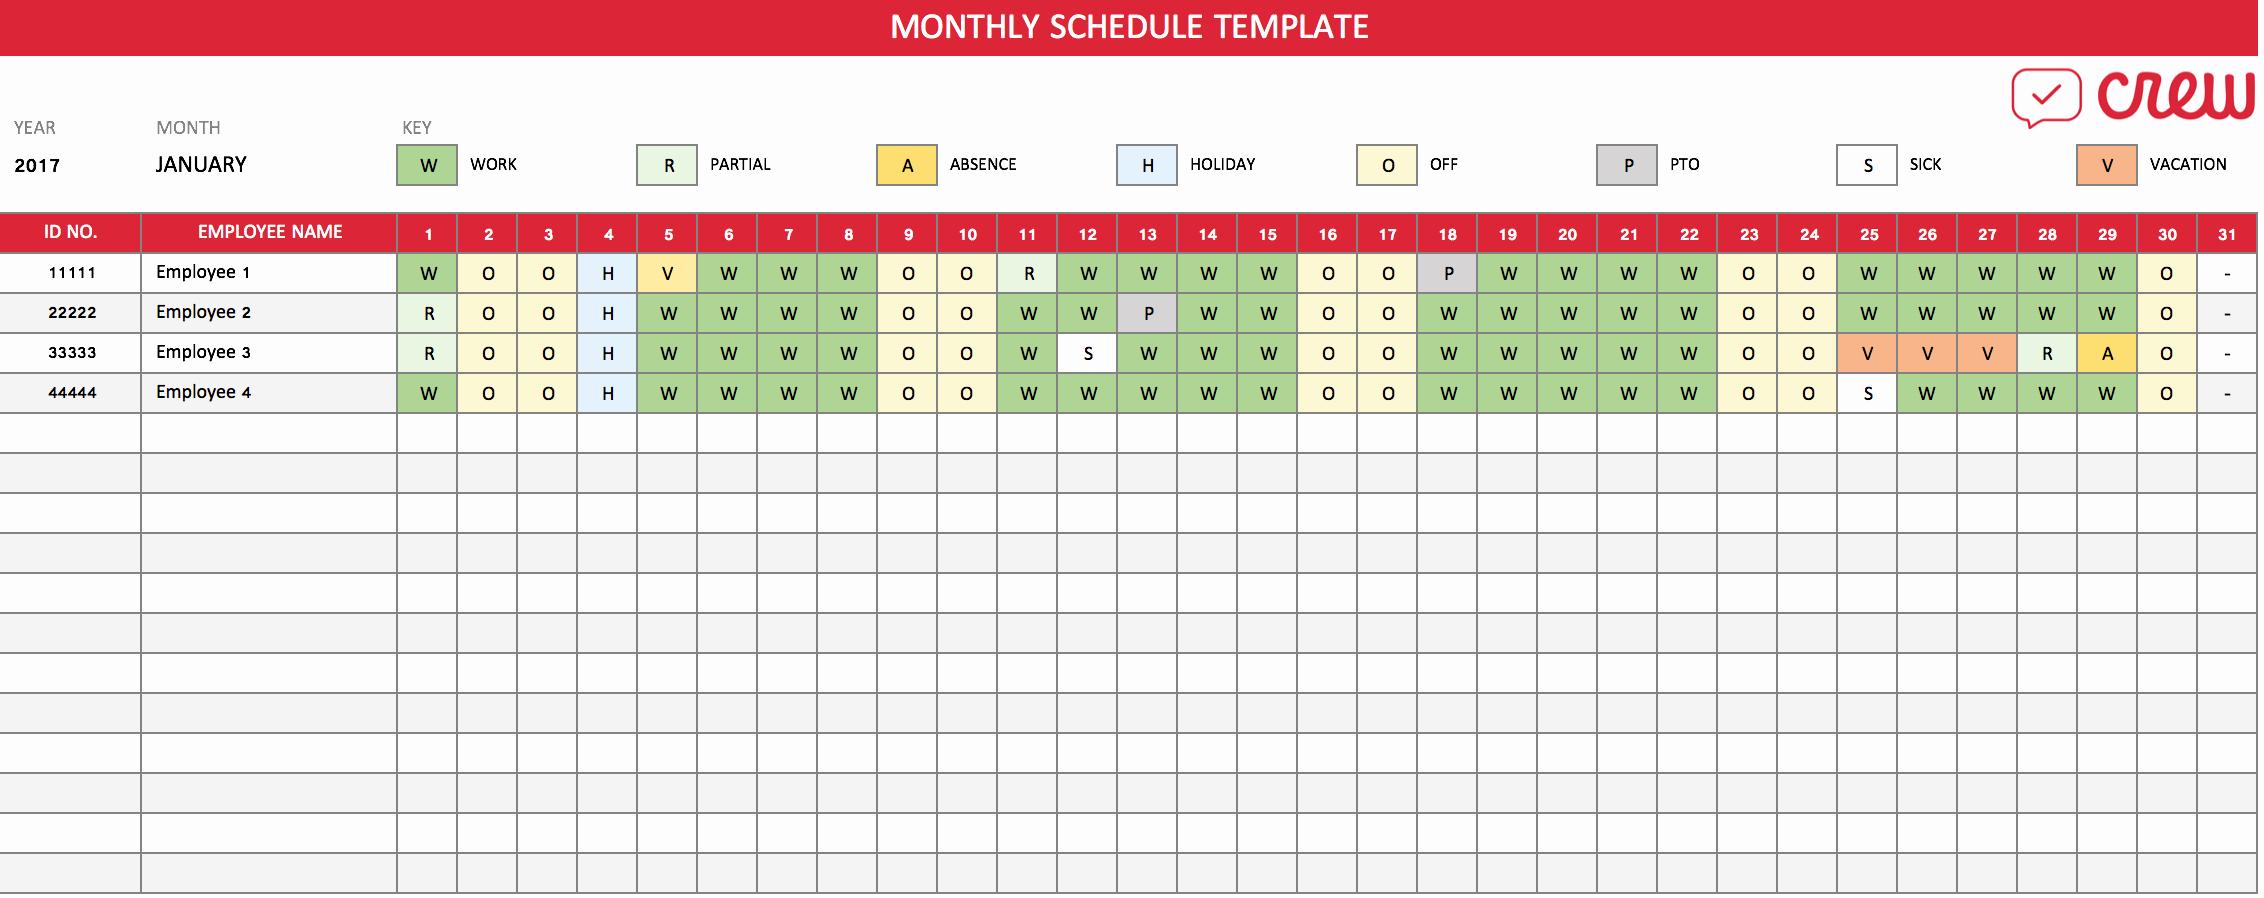 Free Employee Schedule Template Inspirational Free Monthly Work Schedule Template Crew